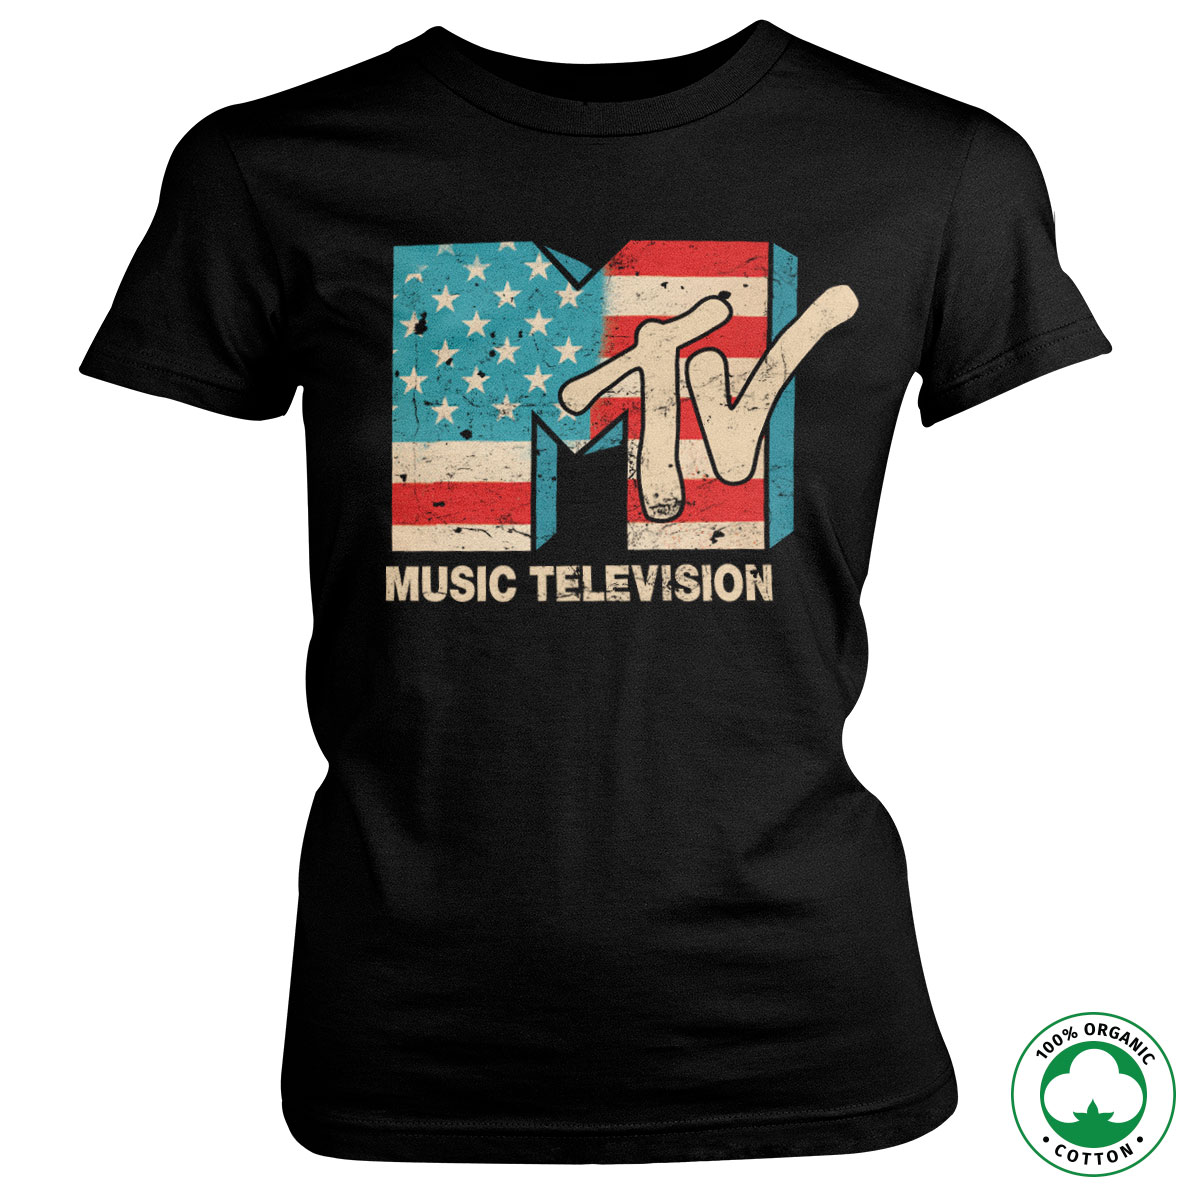 MTV-58-MTV001-BK